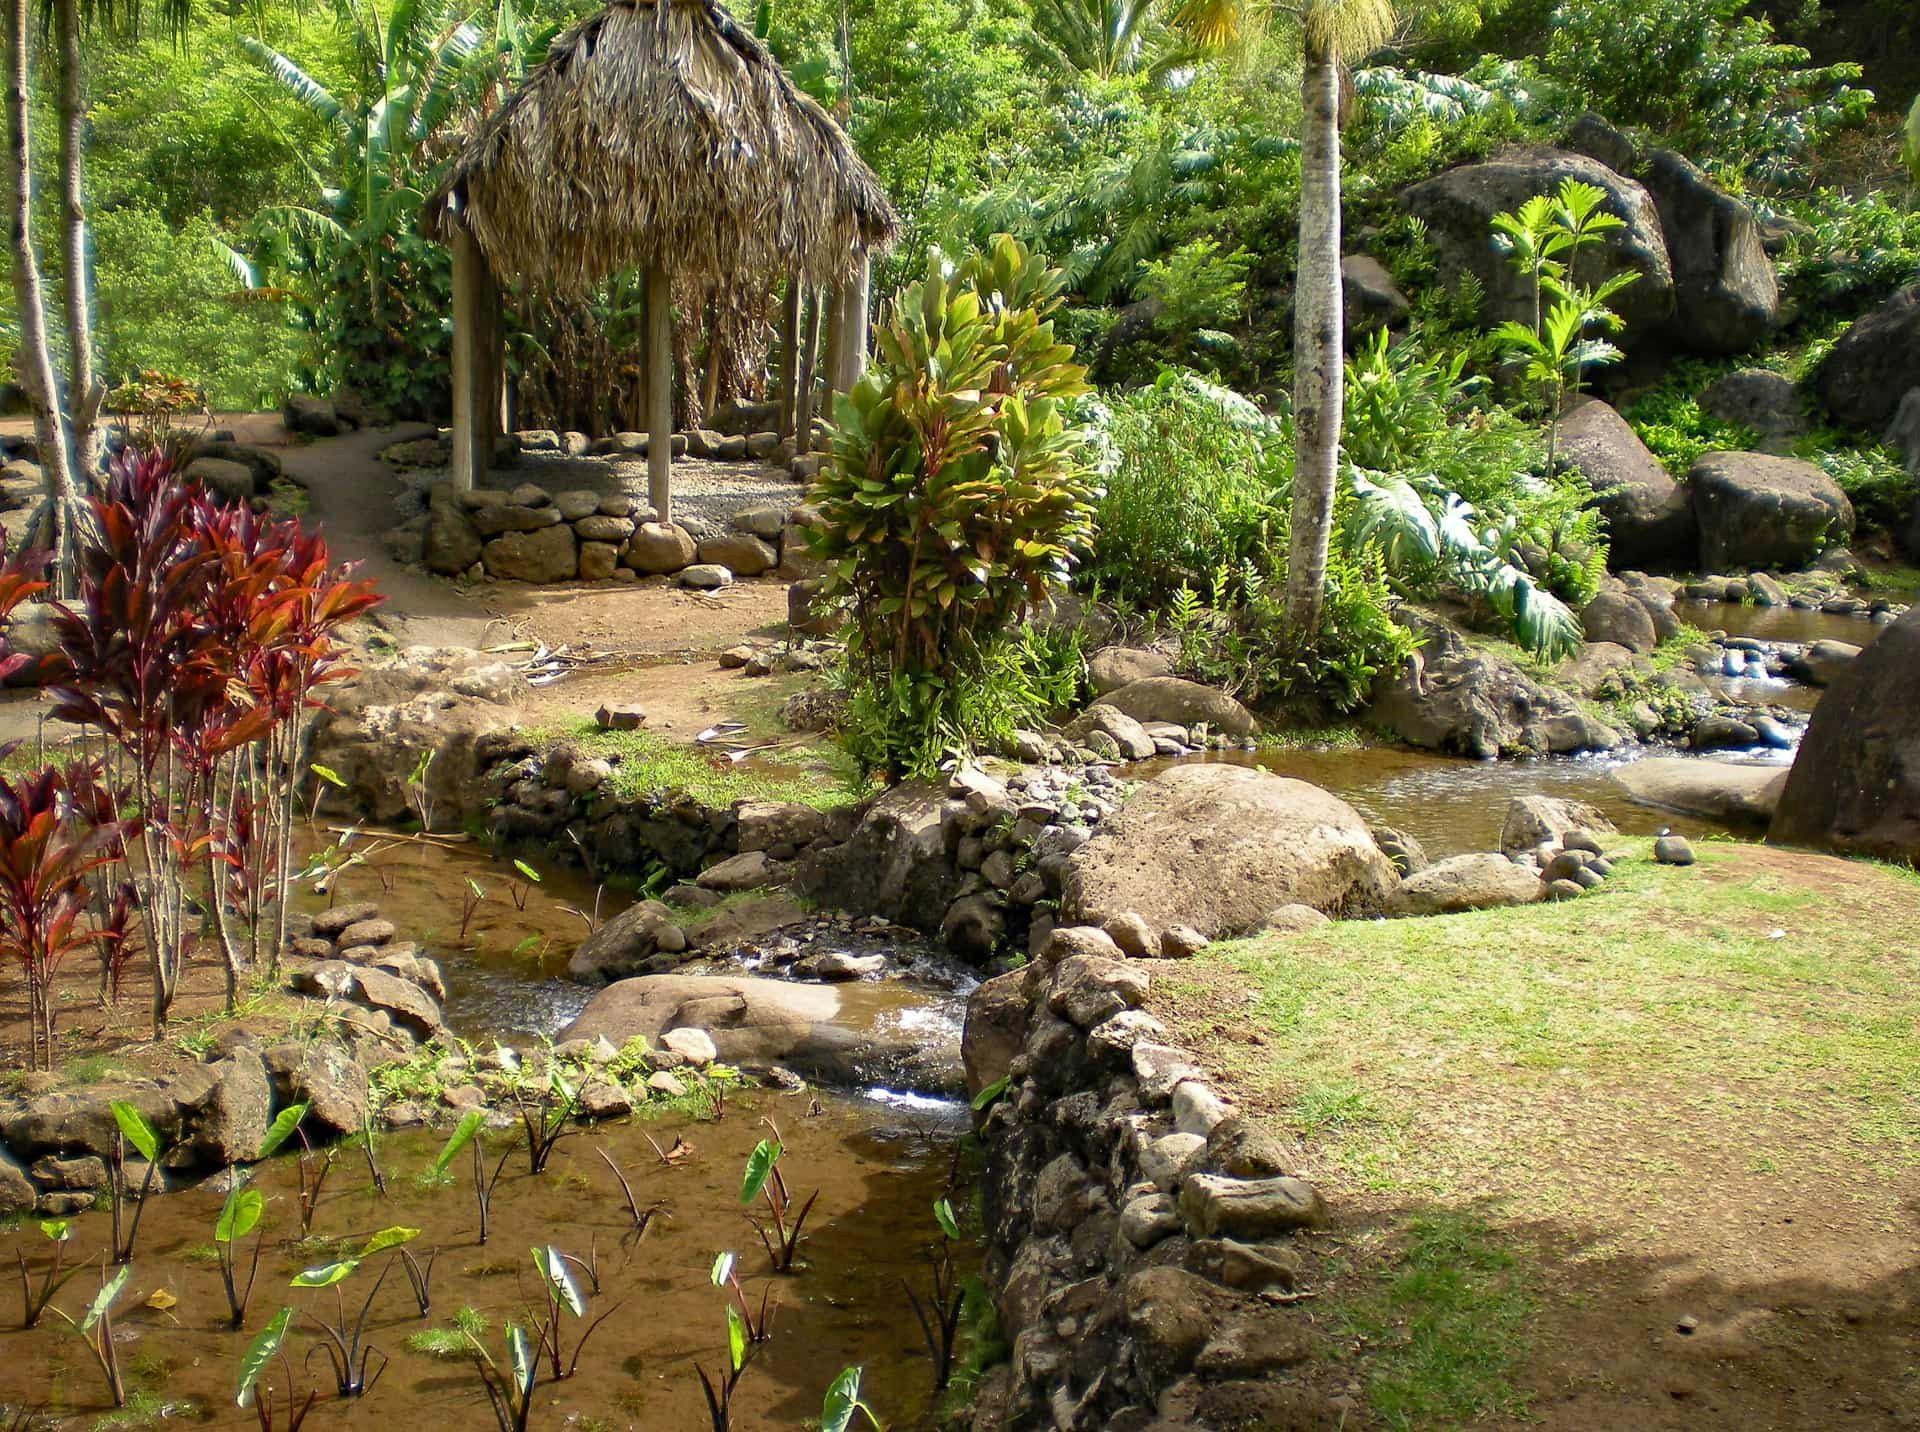 Holo Holo Maui Tours Private Excursion to Iao Valley